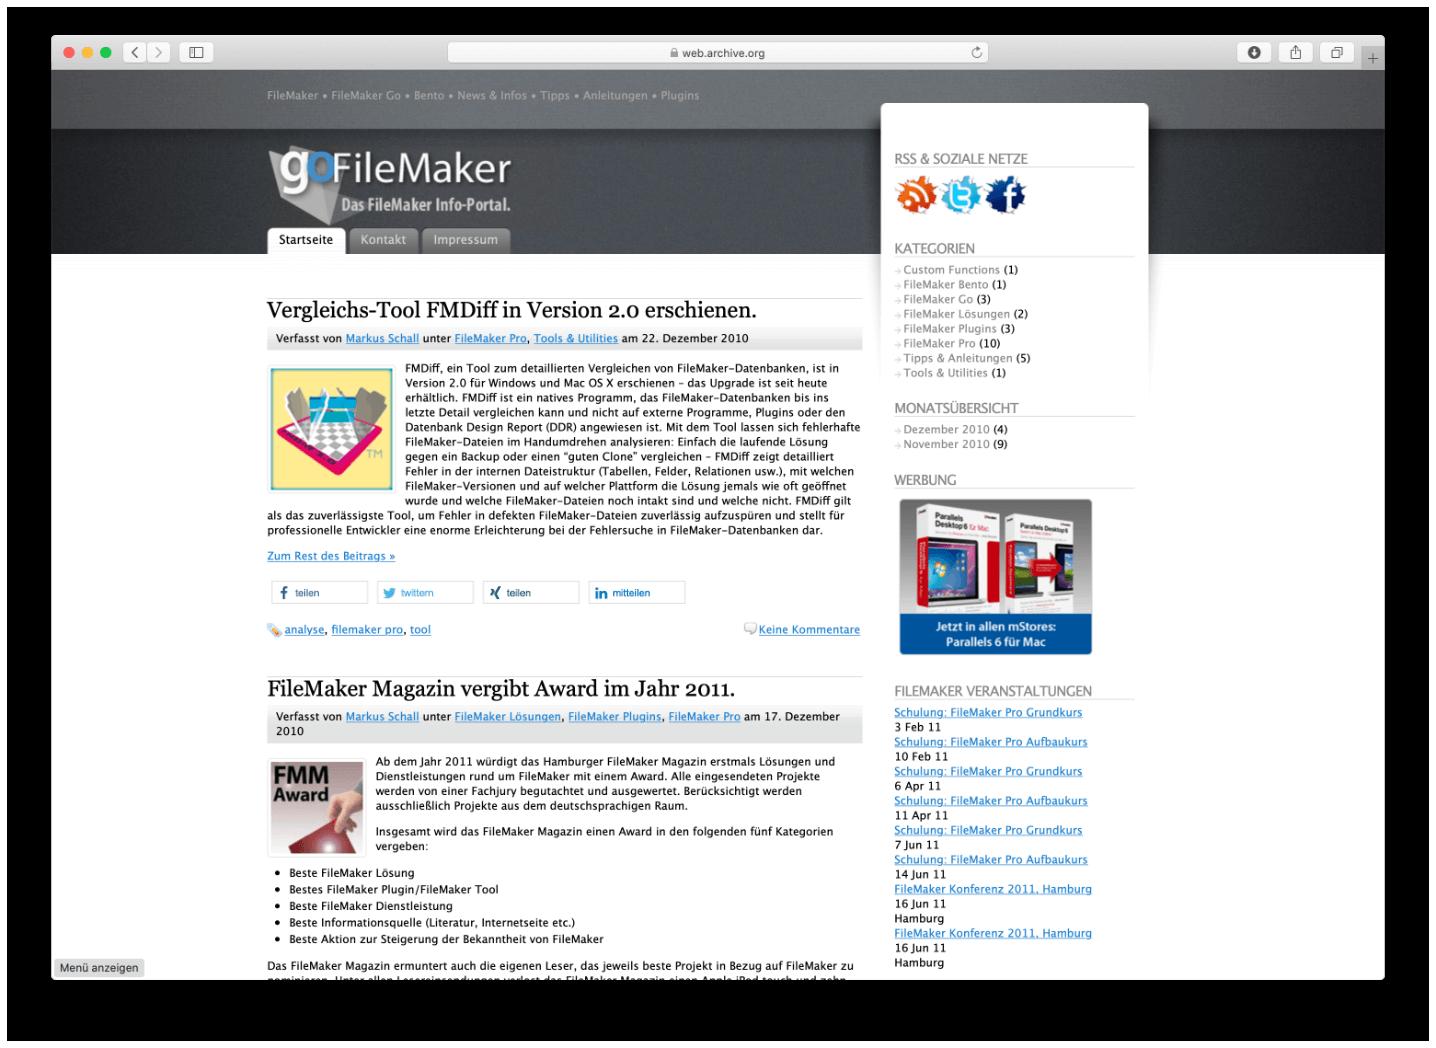 gofilemaker.de ist seit Ende 2010 online